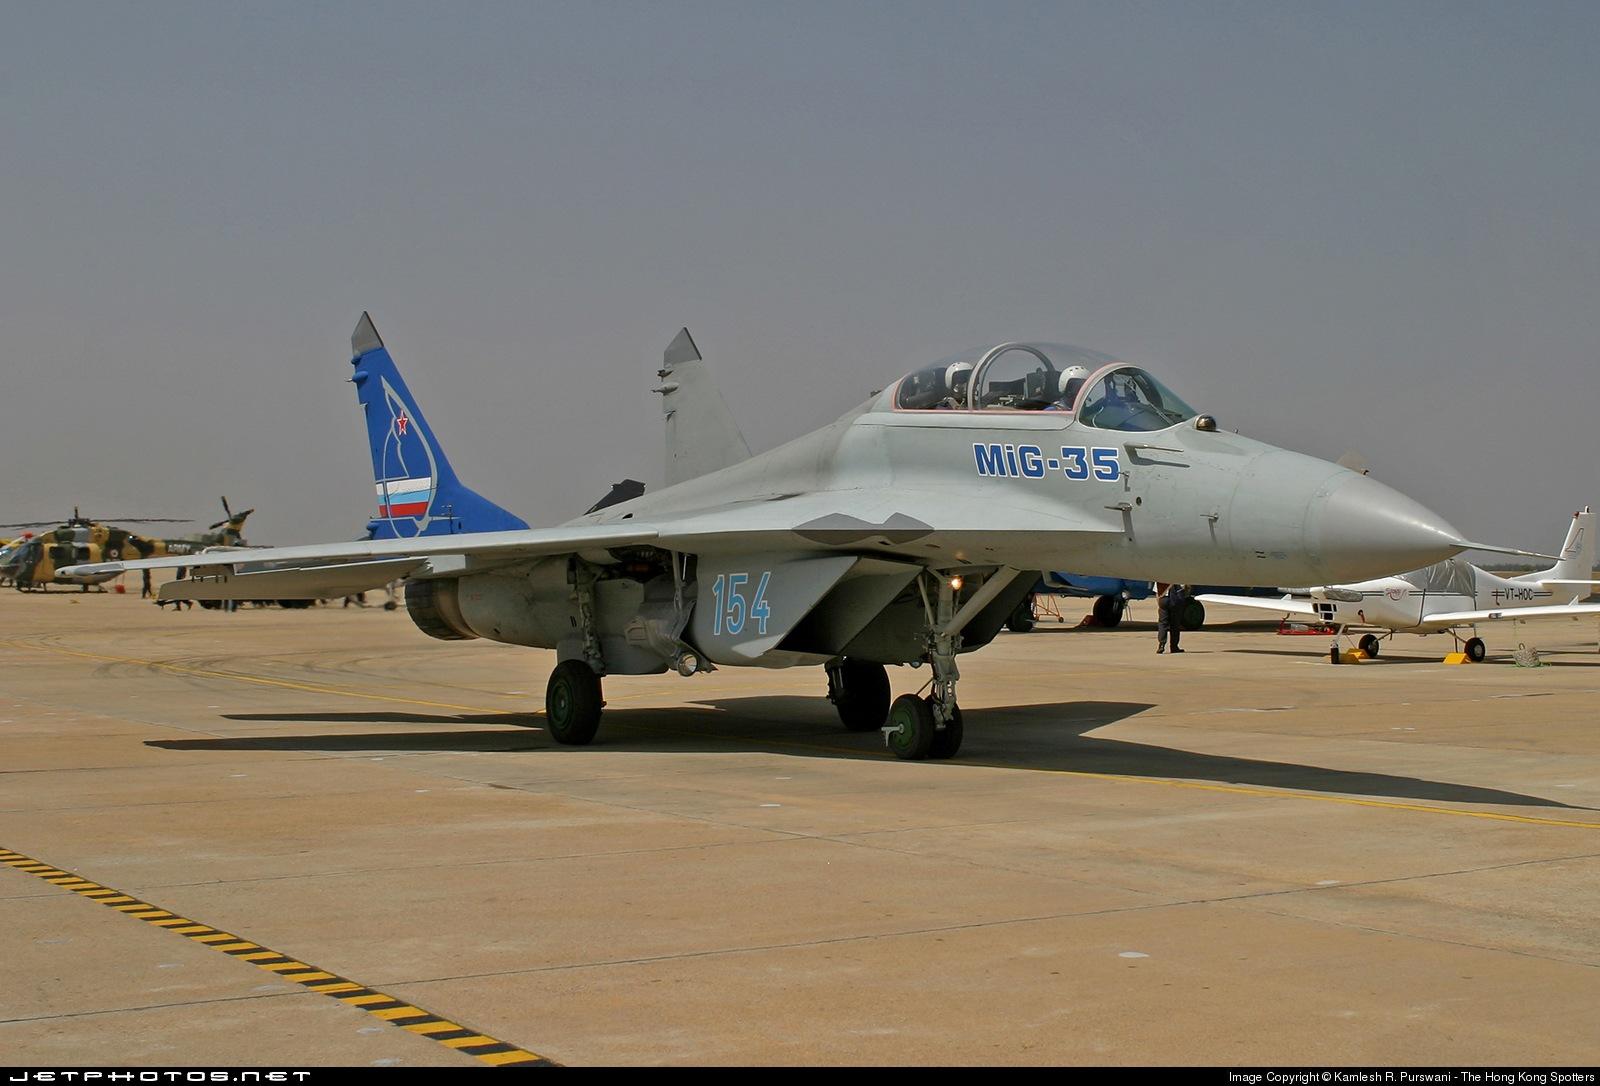 MiG-35 Fulcrum F « MiG Alley Military Aviation News – MiG ...